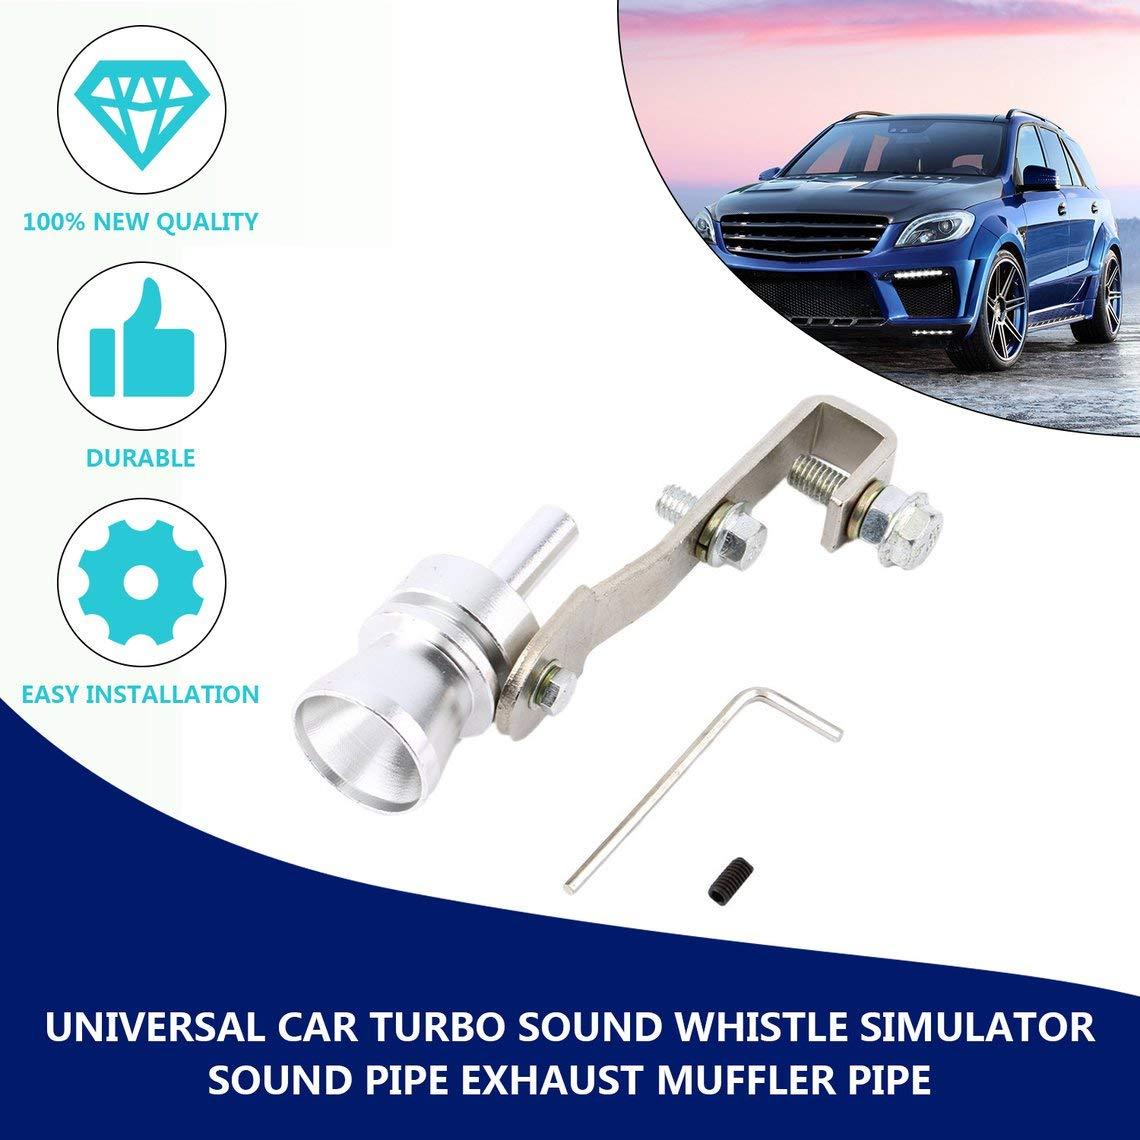 Zinniaya Universal Aluminium Cars Auto BOV Turbo Sonido Silbato Tubo Sonido Simulador Tubo Tubo de escape Silenciador Tubo